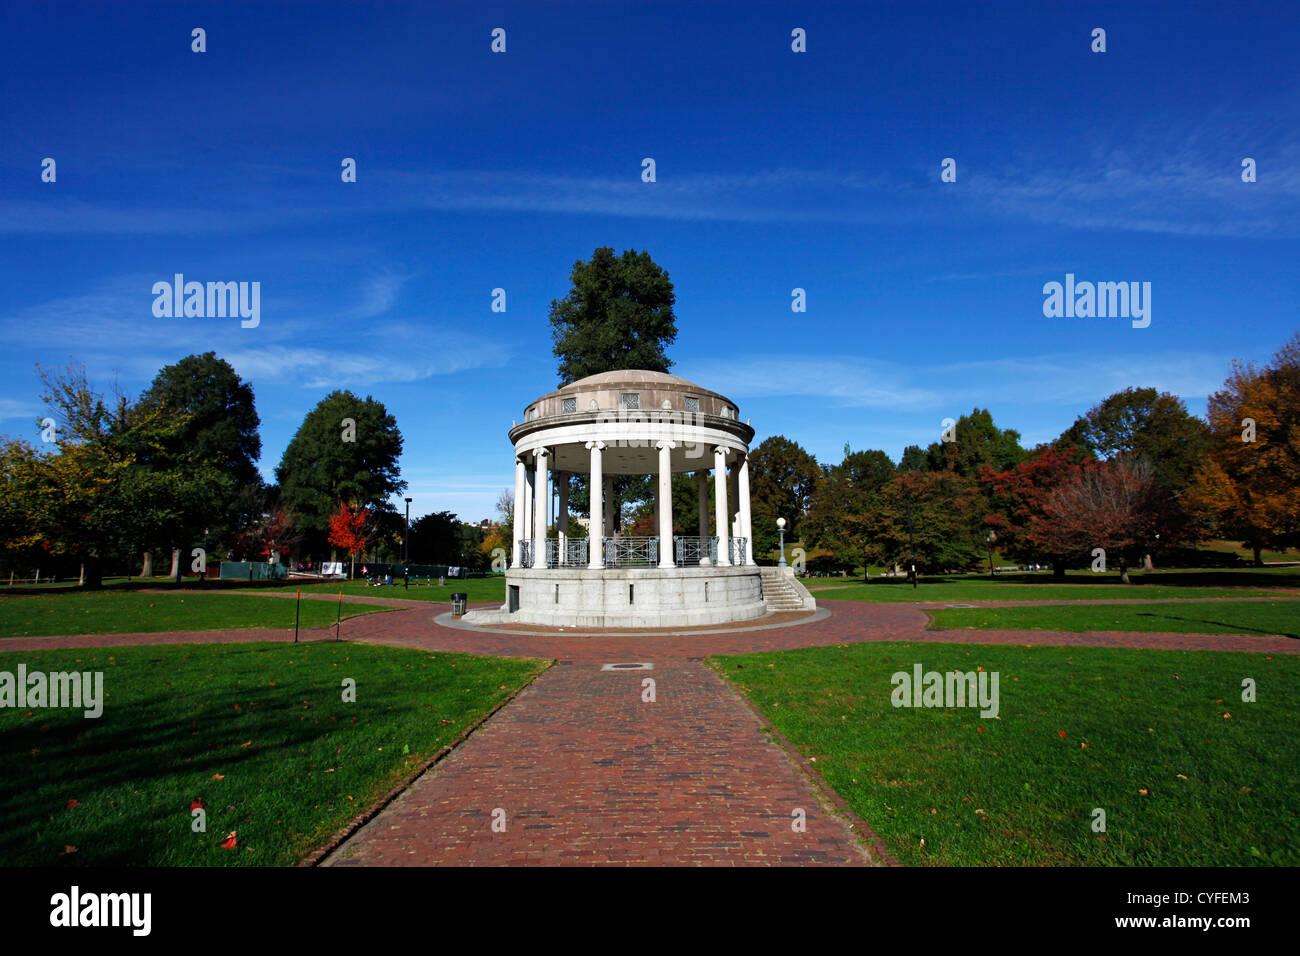 Parkman Bandstand in the park on Boston Common, Boston, Massachusetts, America - Stock Image